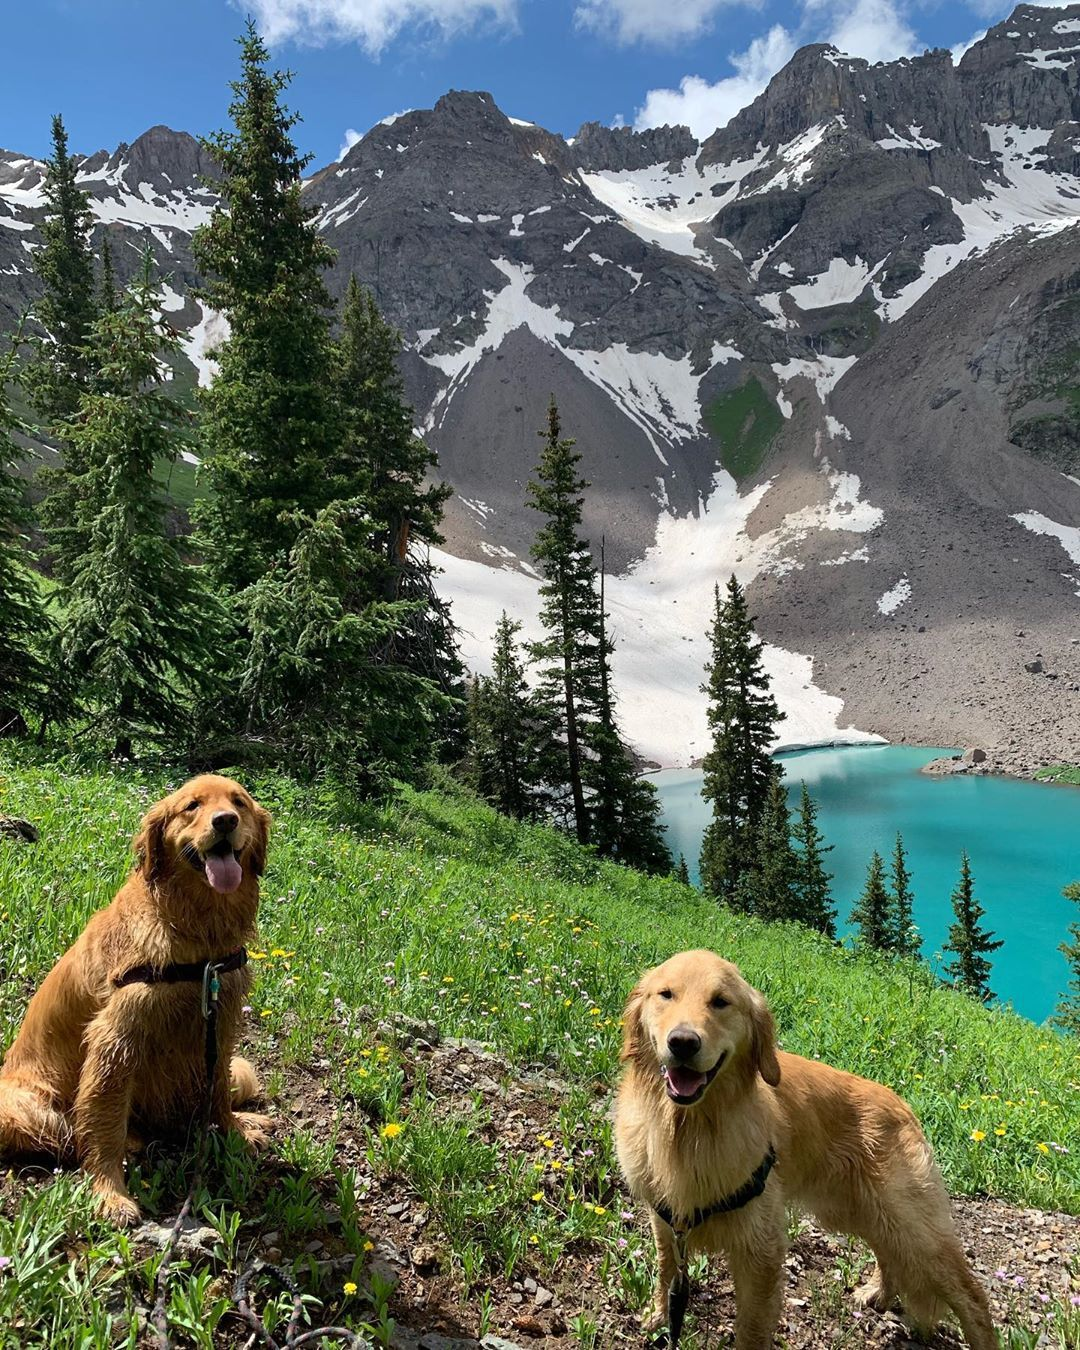 Lucy Oskar On Instagram Wanderlust Wednesday Thegreatbigworld Mountains Mountainshotz Goldens With Images Cute Cats And Dogs Dogs Golden Retriever Cute Dogs